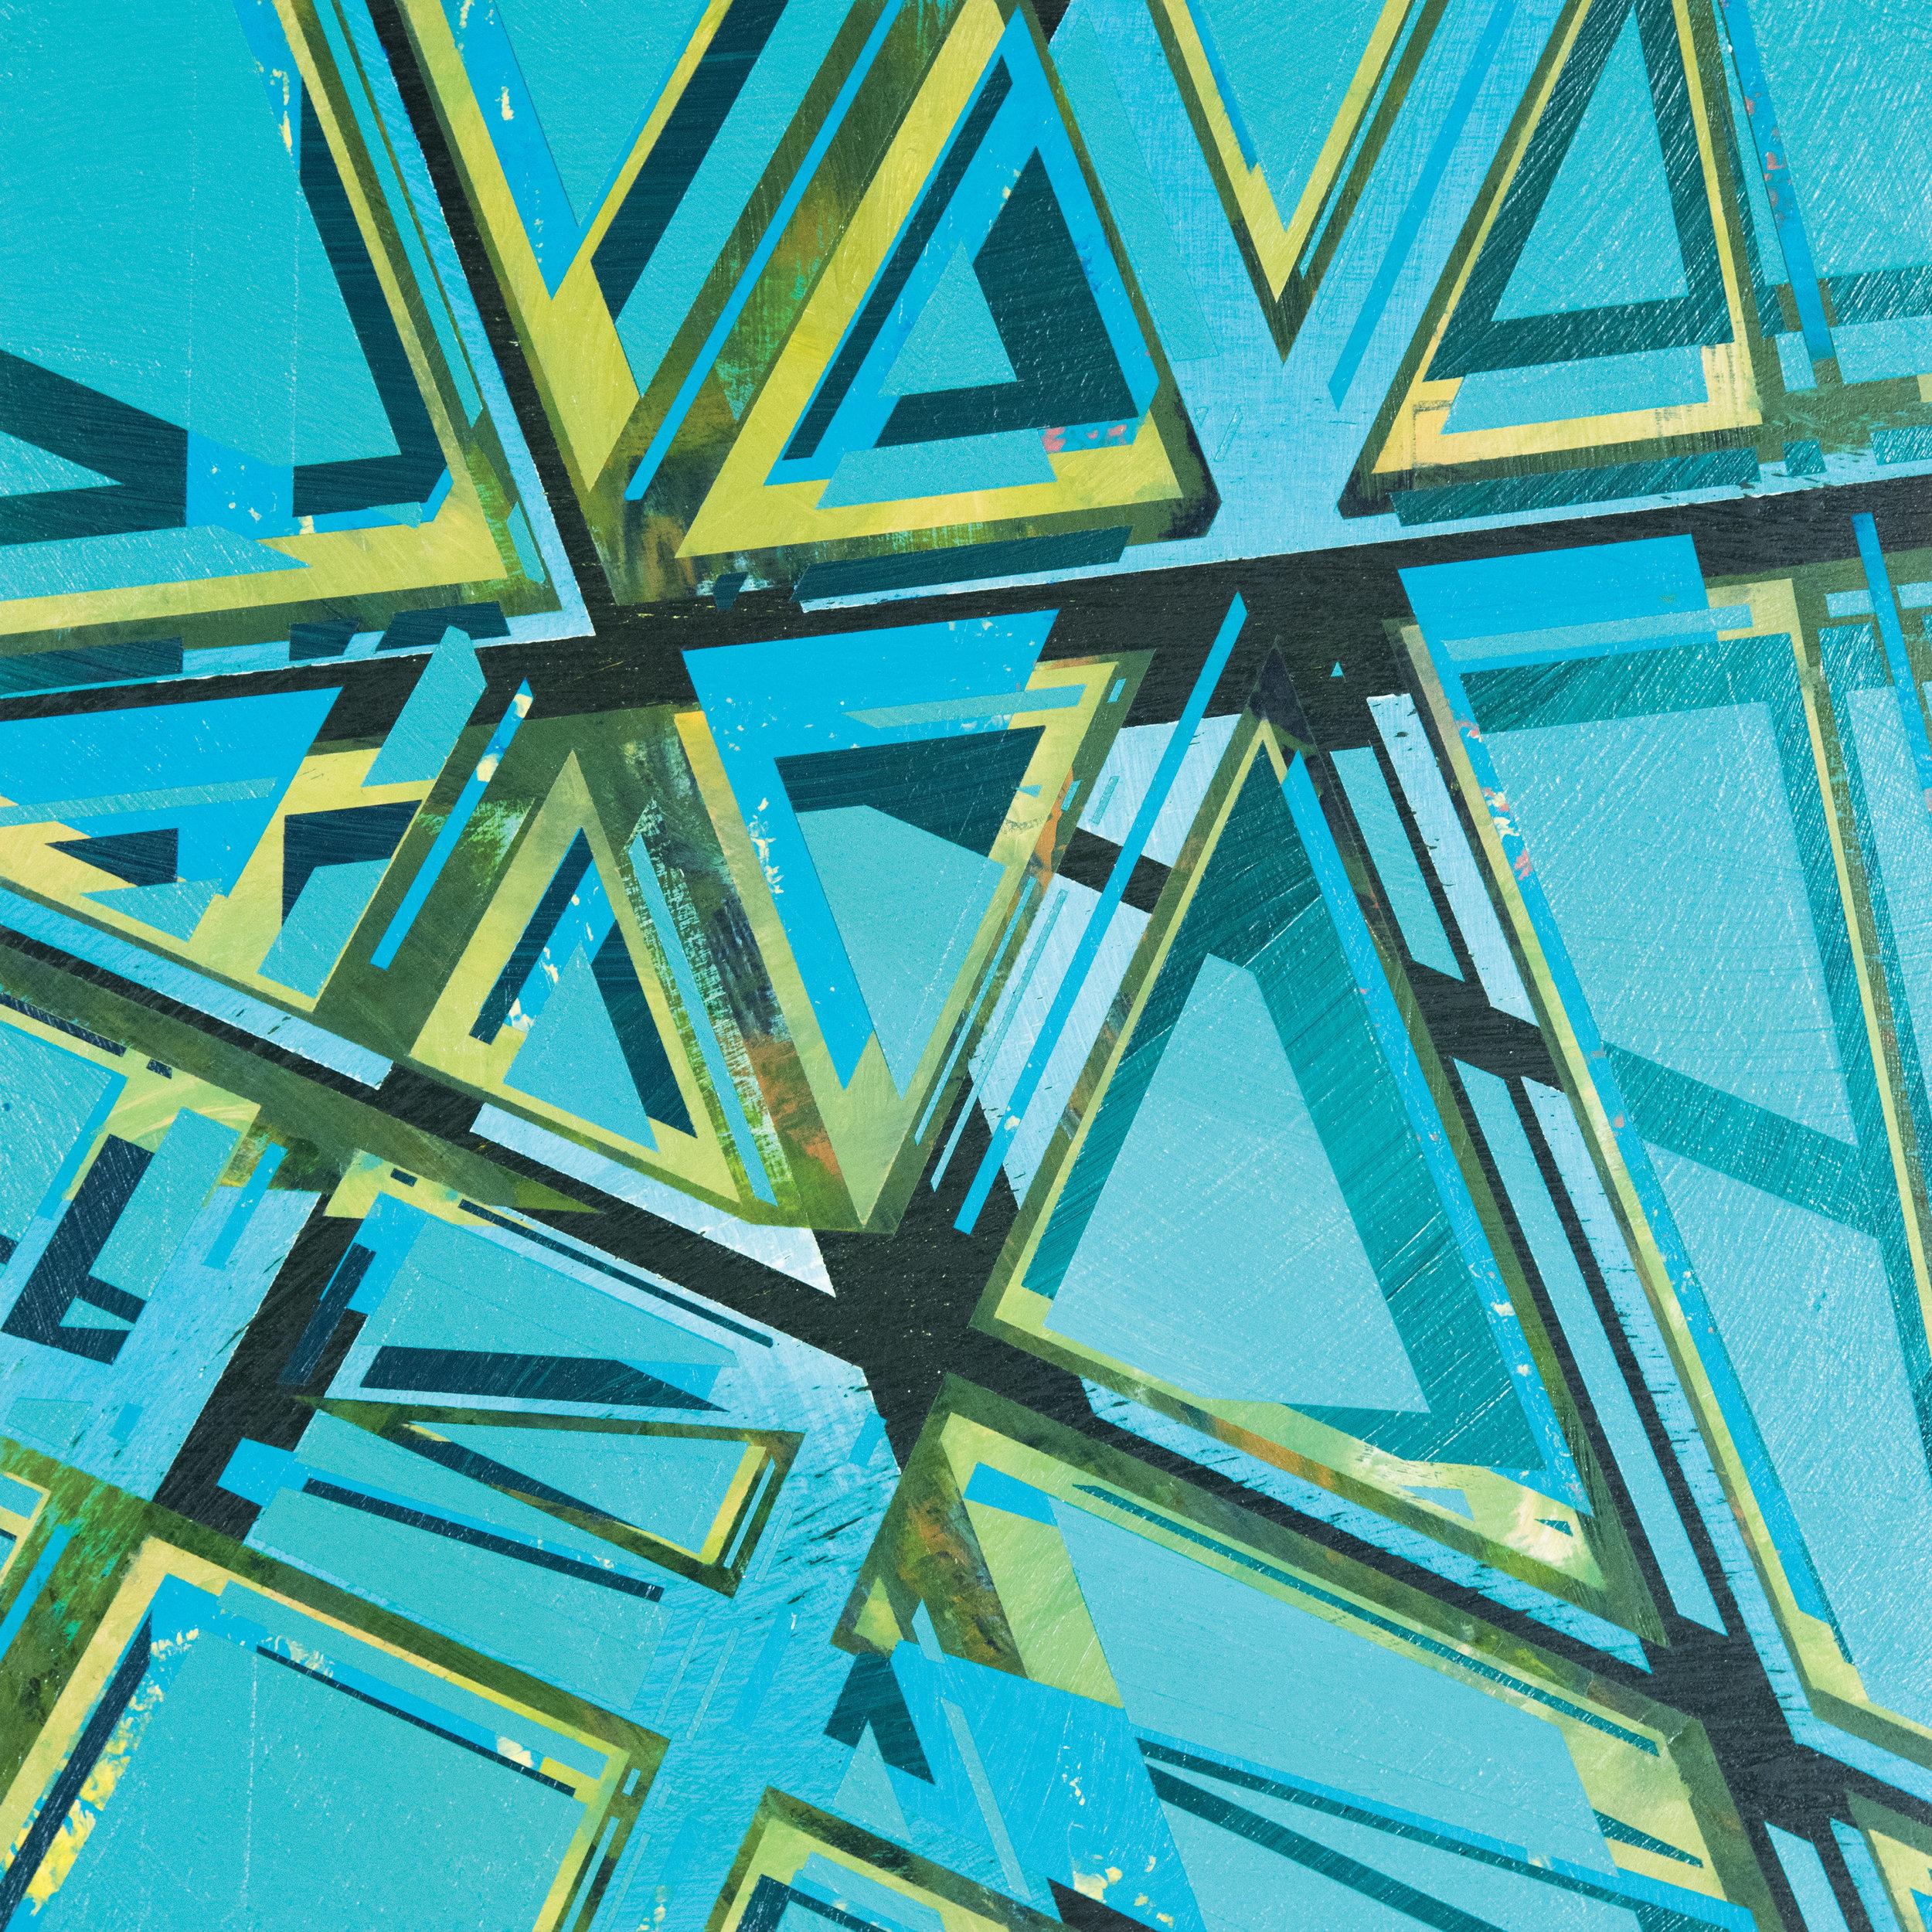 Daniel_Stuelpnagel-_Unperturbed_Until_This_Moment_-18x18_-acryliconwoodpanel-2018-$600.jpg